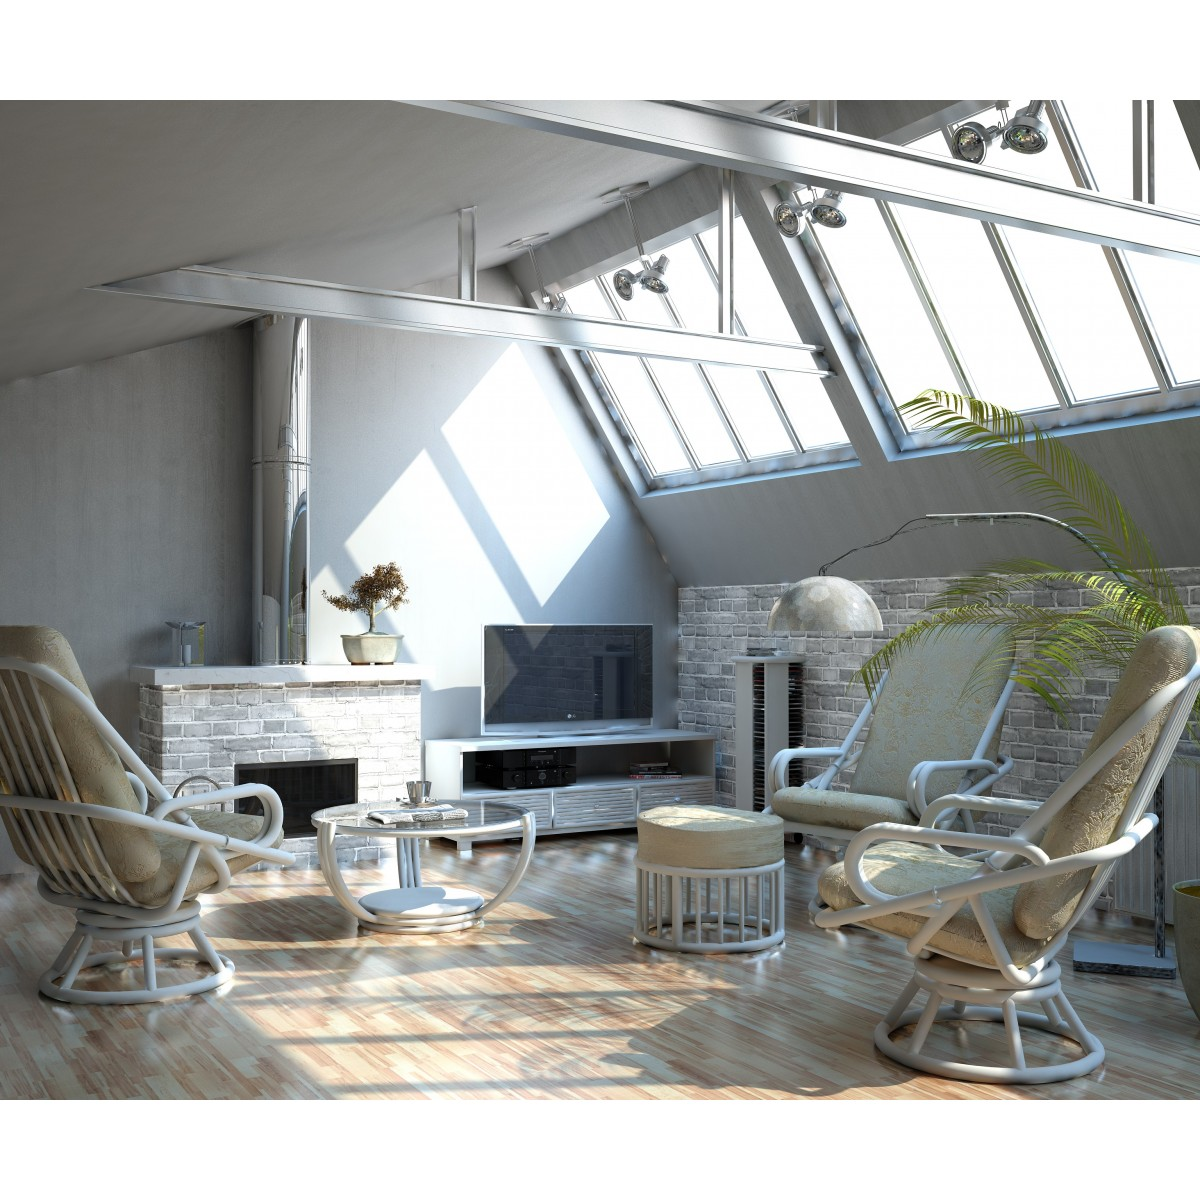 salon en rotin relax confortable. Black Bedroom Furniture Sets. Home Design Ideas